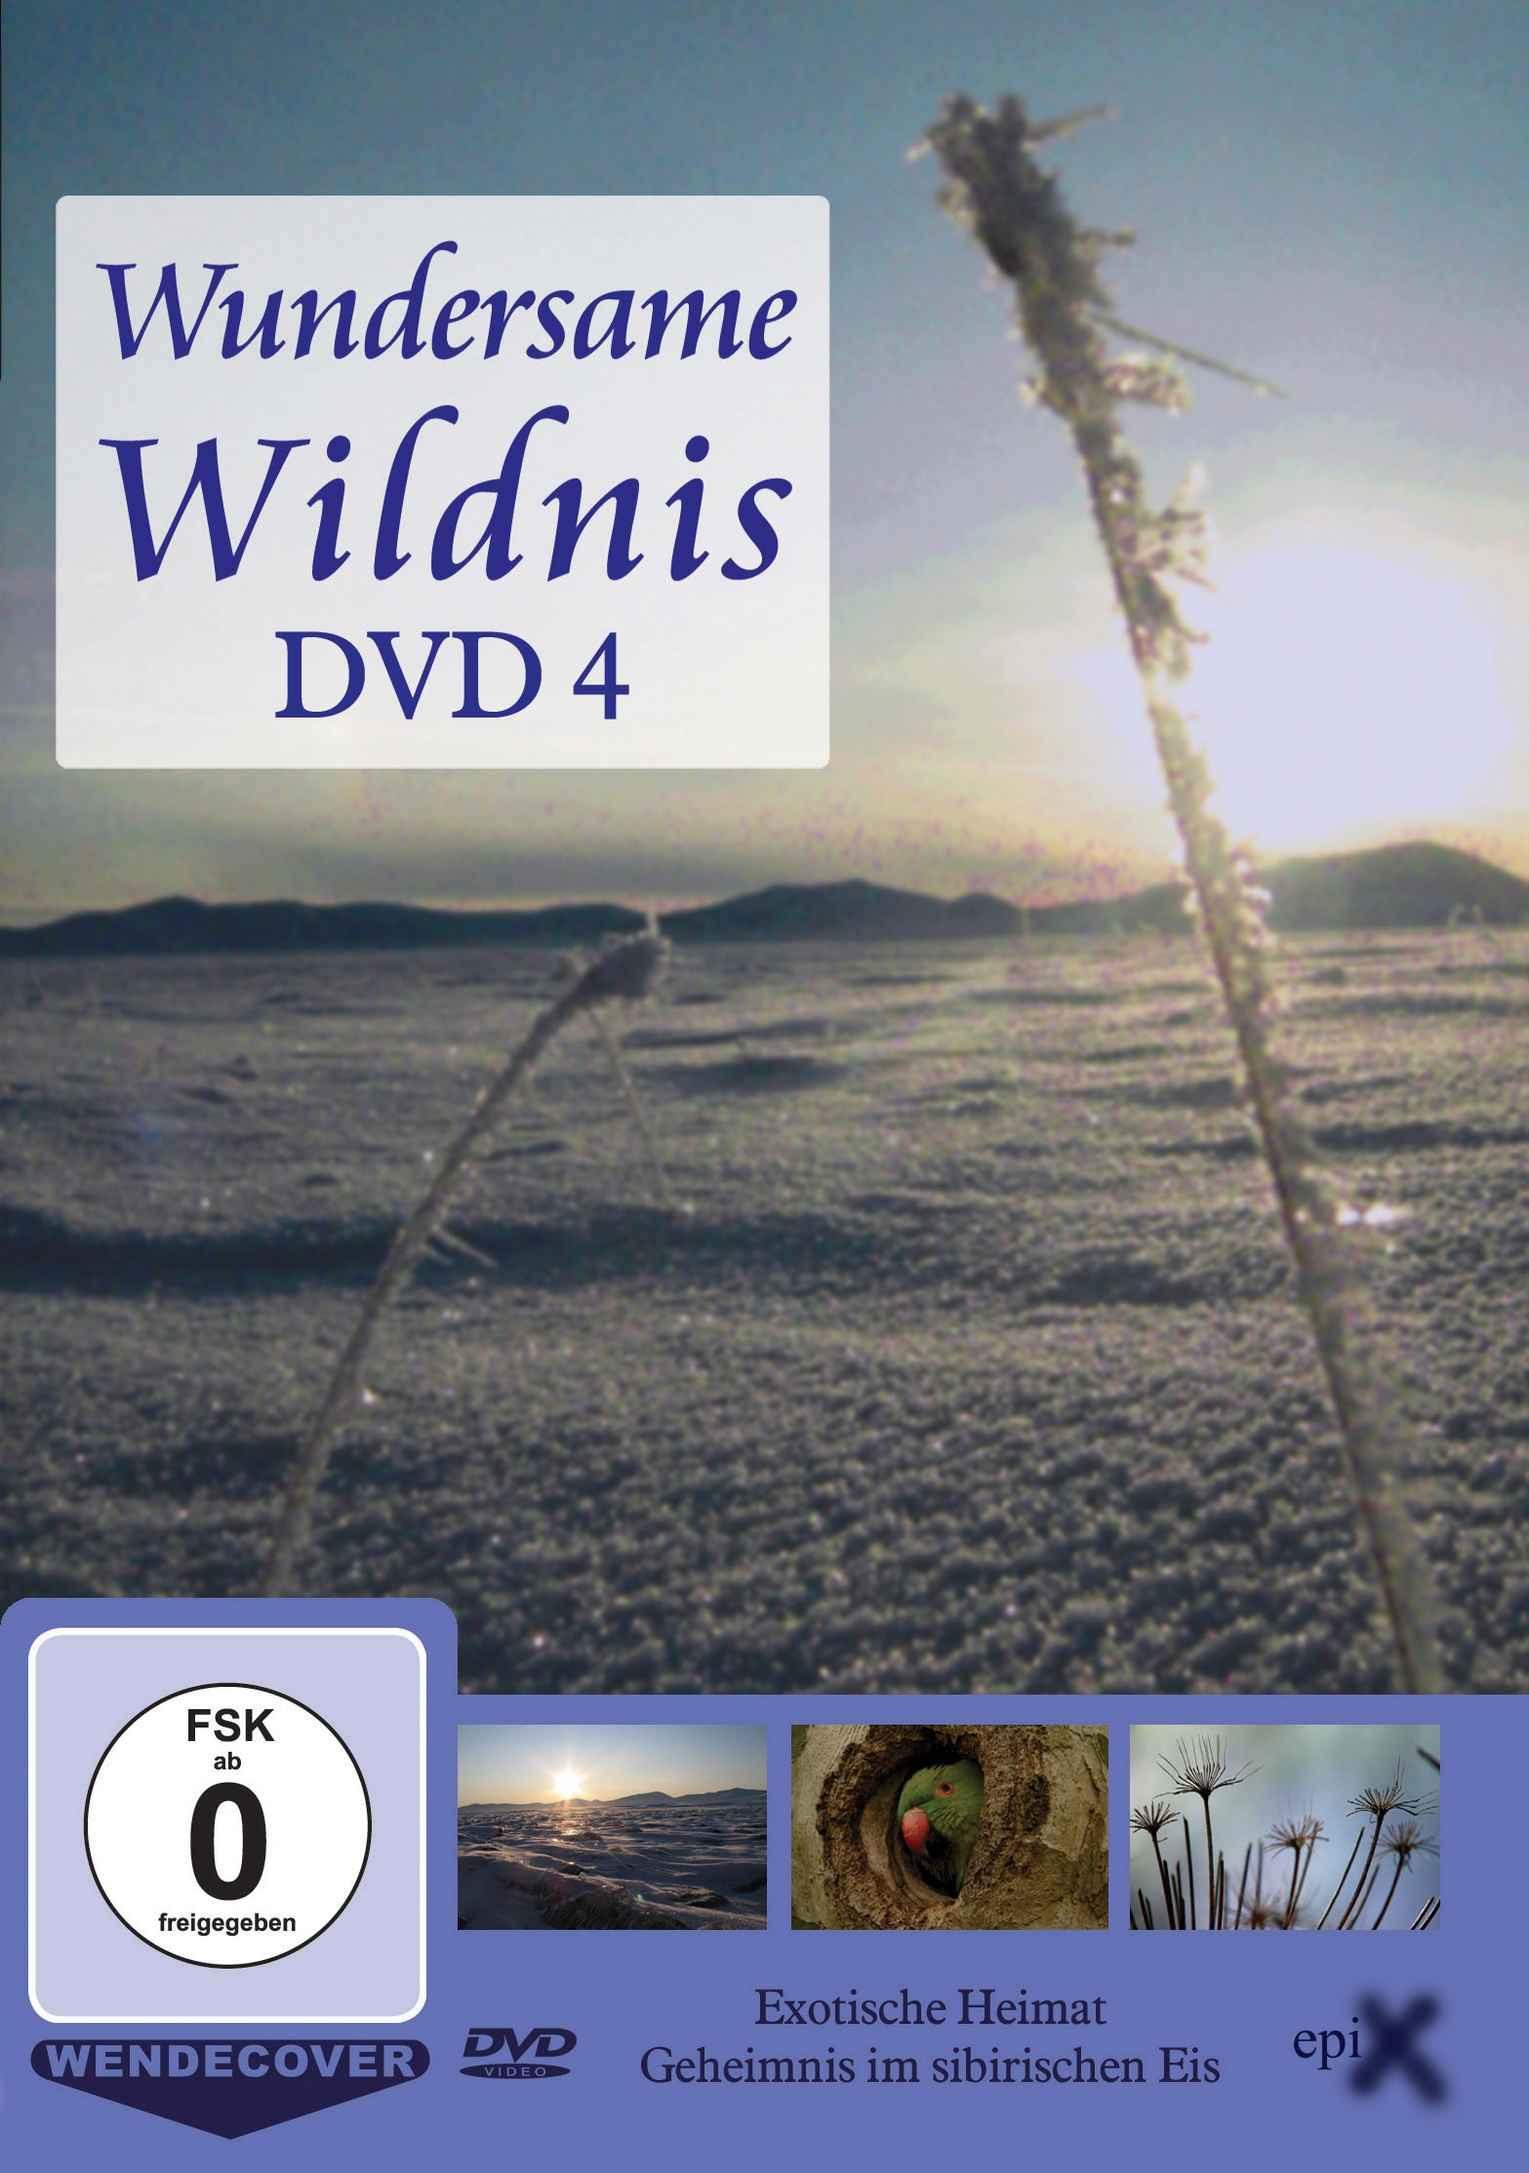 WUNDERSAME WILDNIS DVD 4 Front FINAL